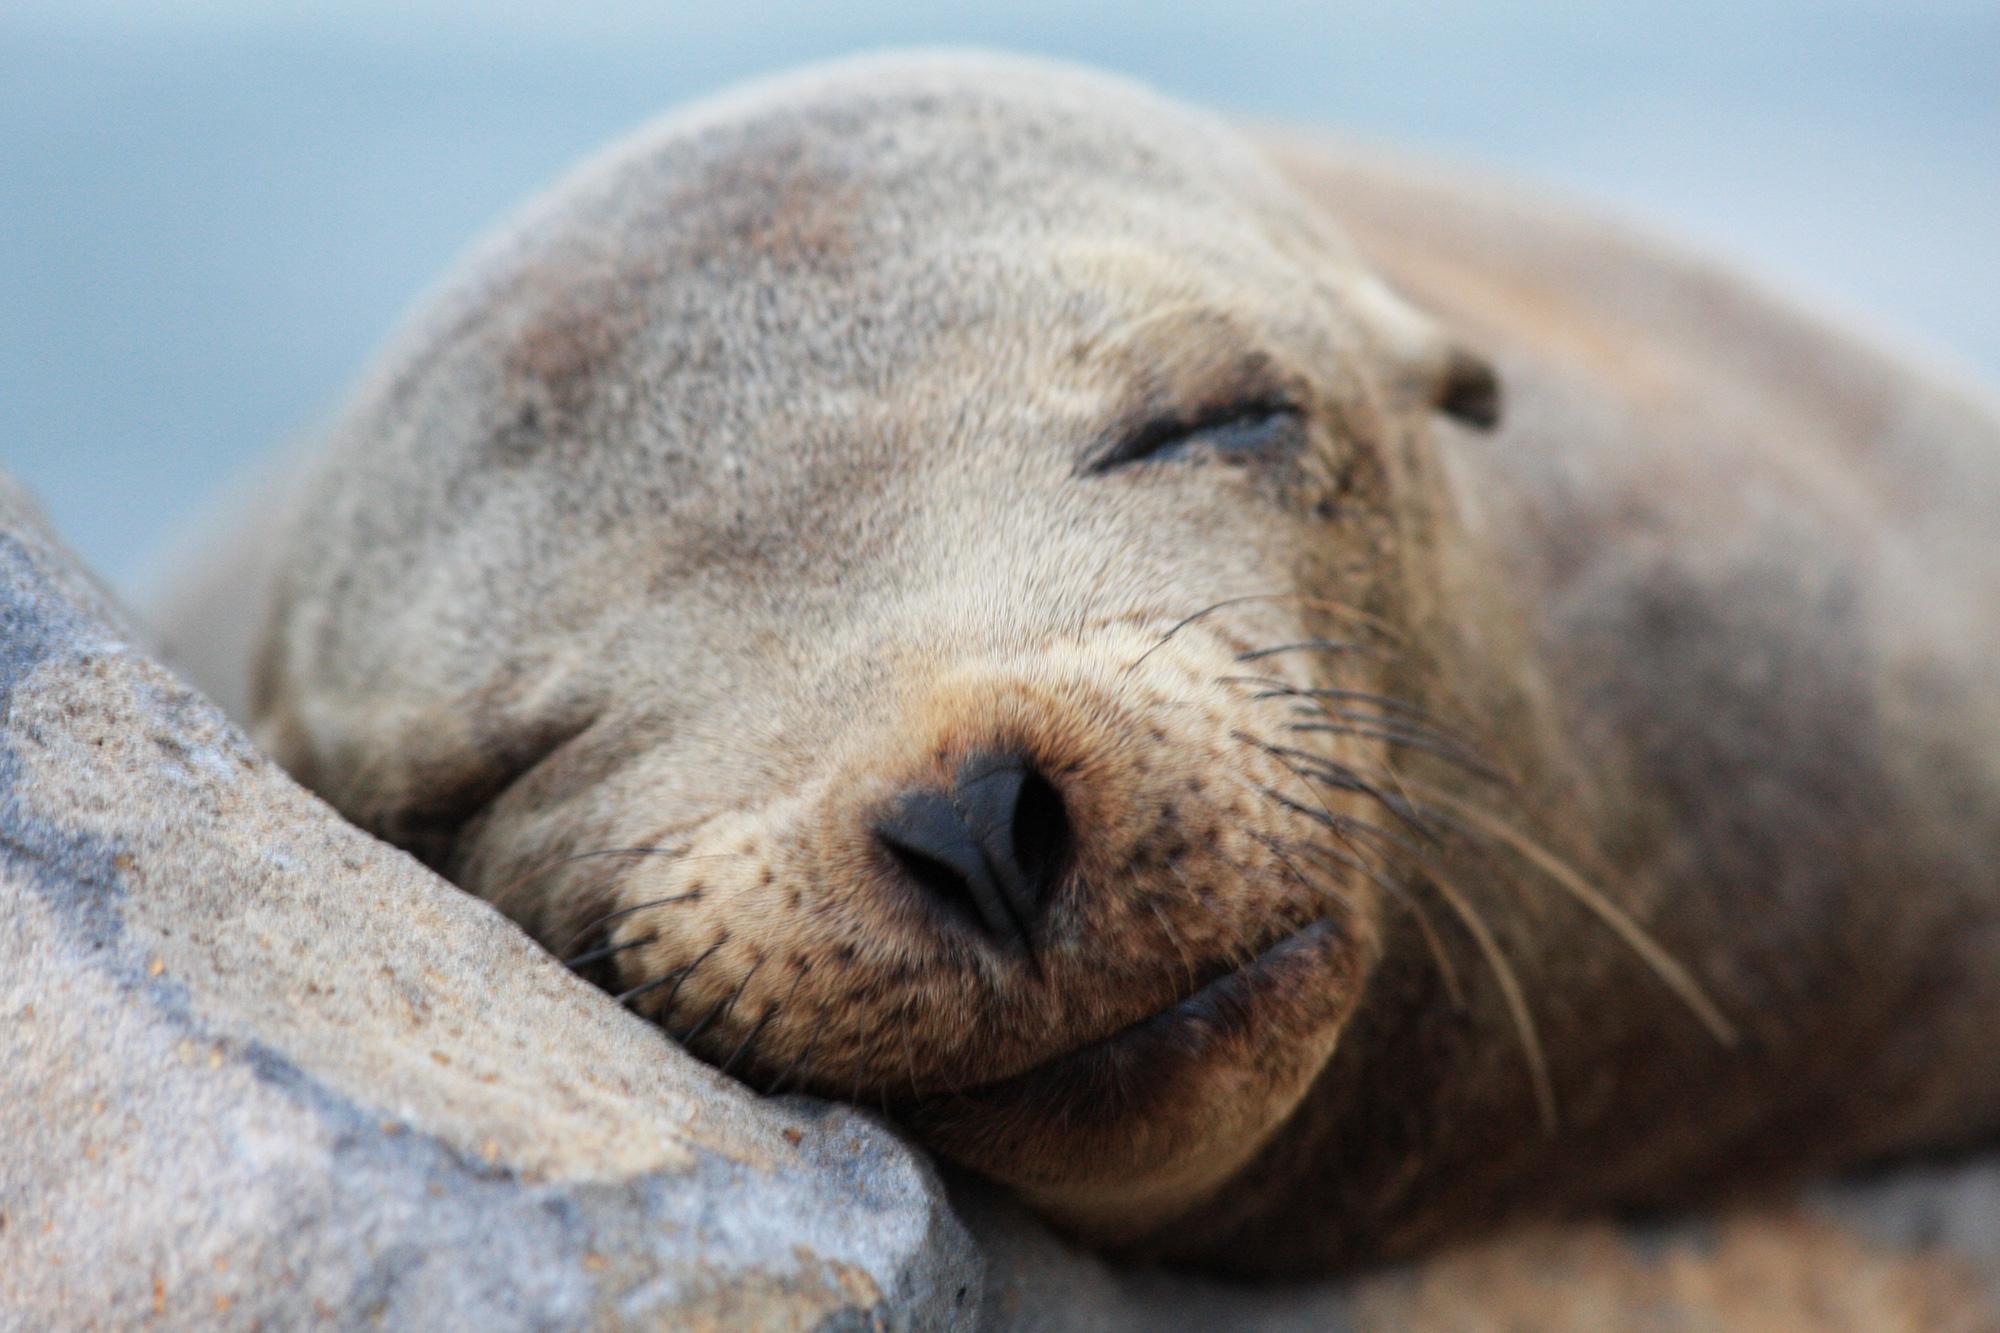 Cute Baby Seals Wallpapers Seal Fish Pictures Hd Desktop Wallpapers 4k Hd